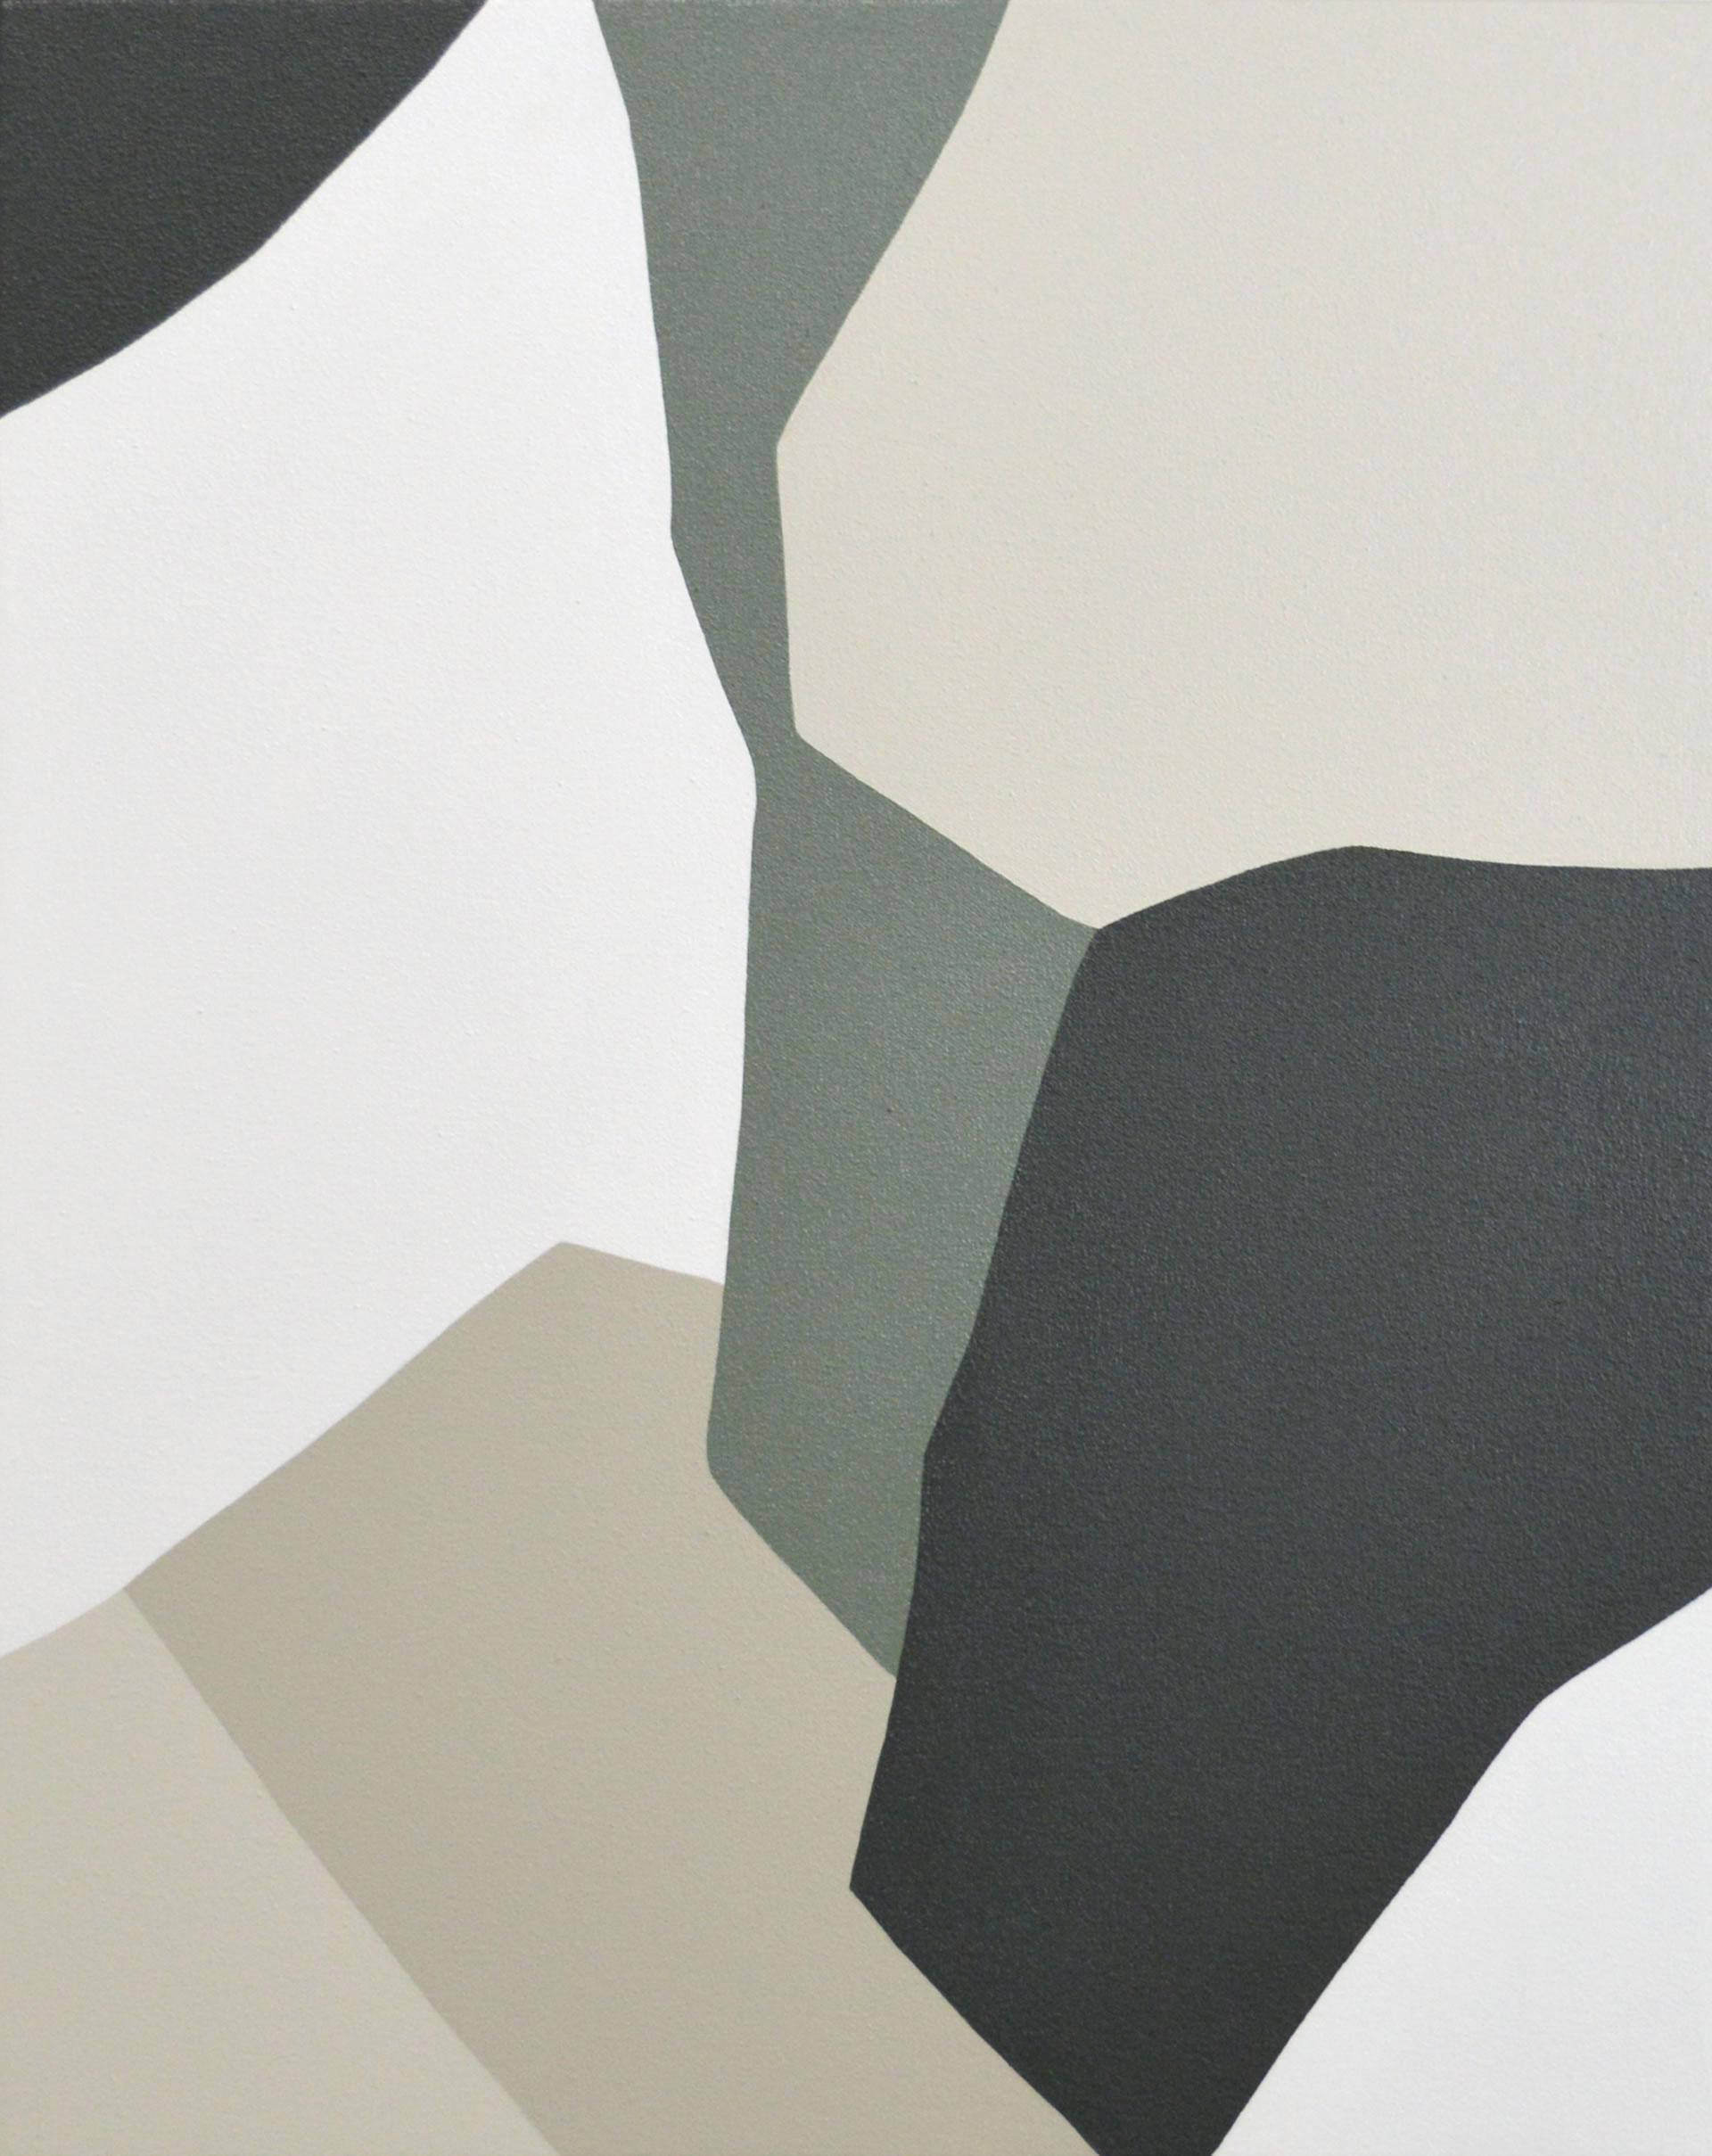 Lesley-Anderson-Dreamscape-20x16-Online-Art-Galleries